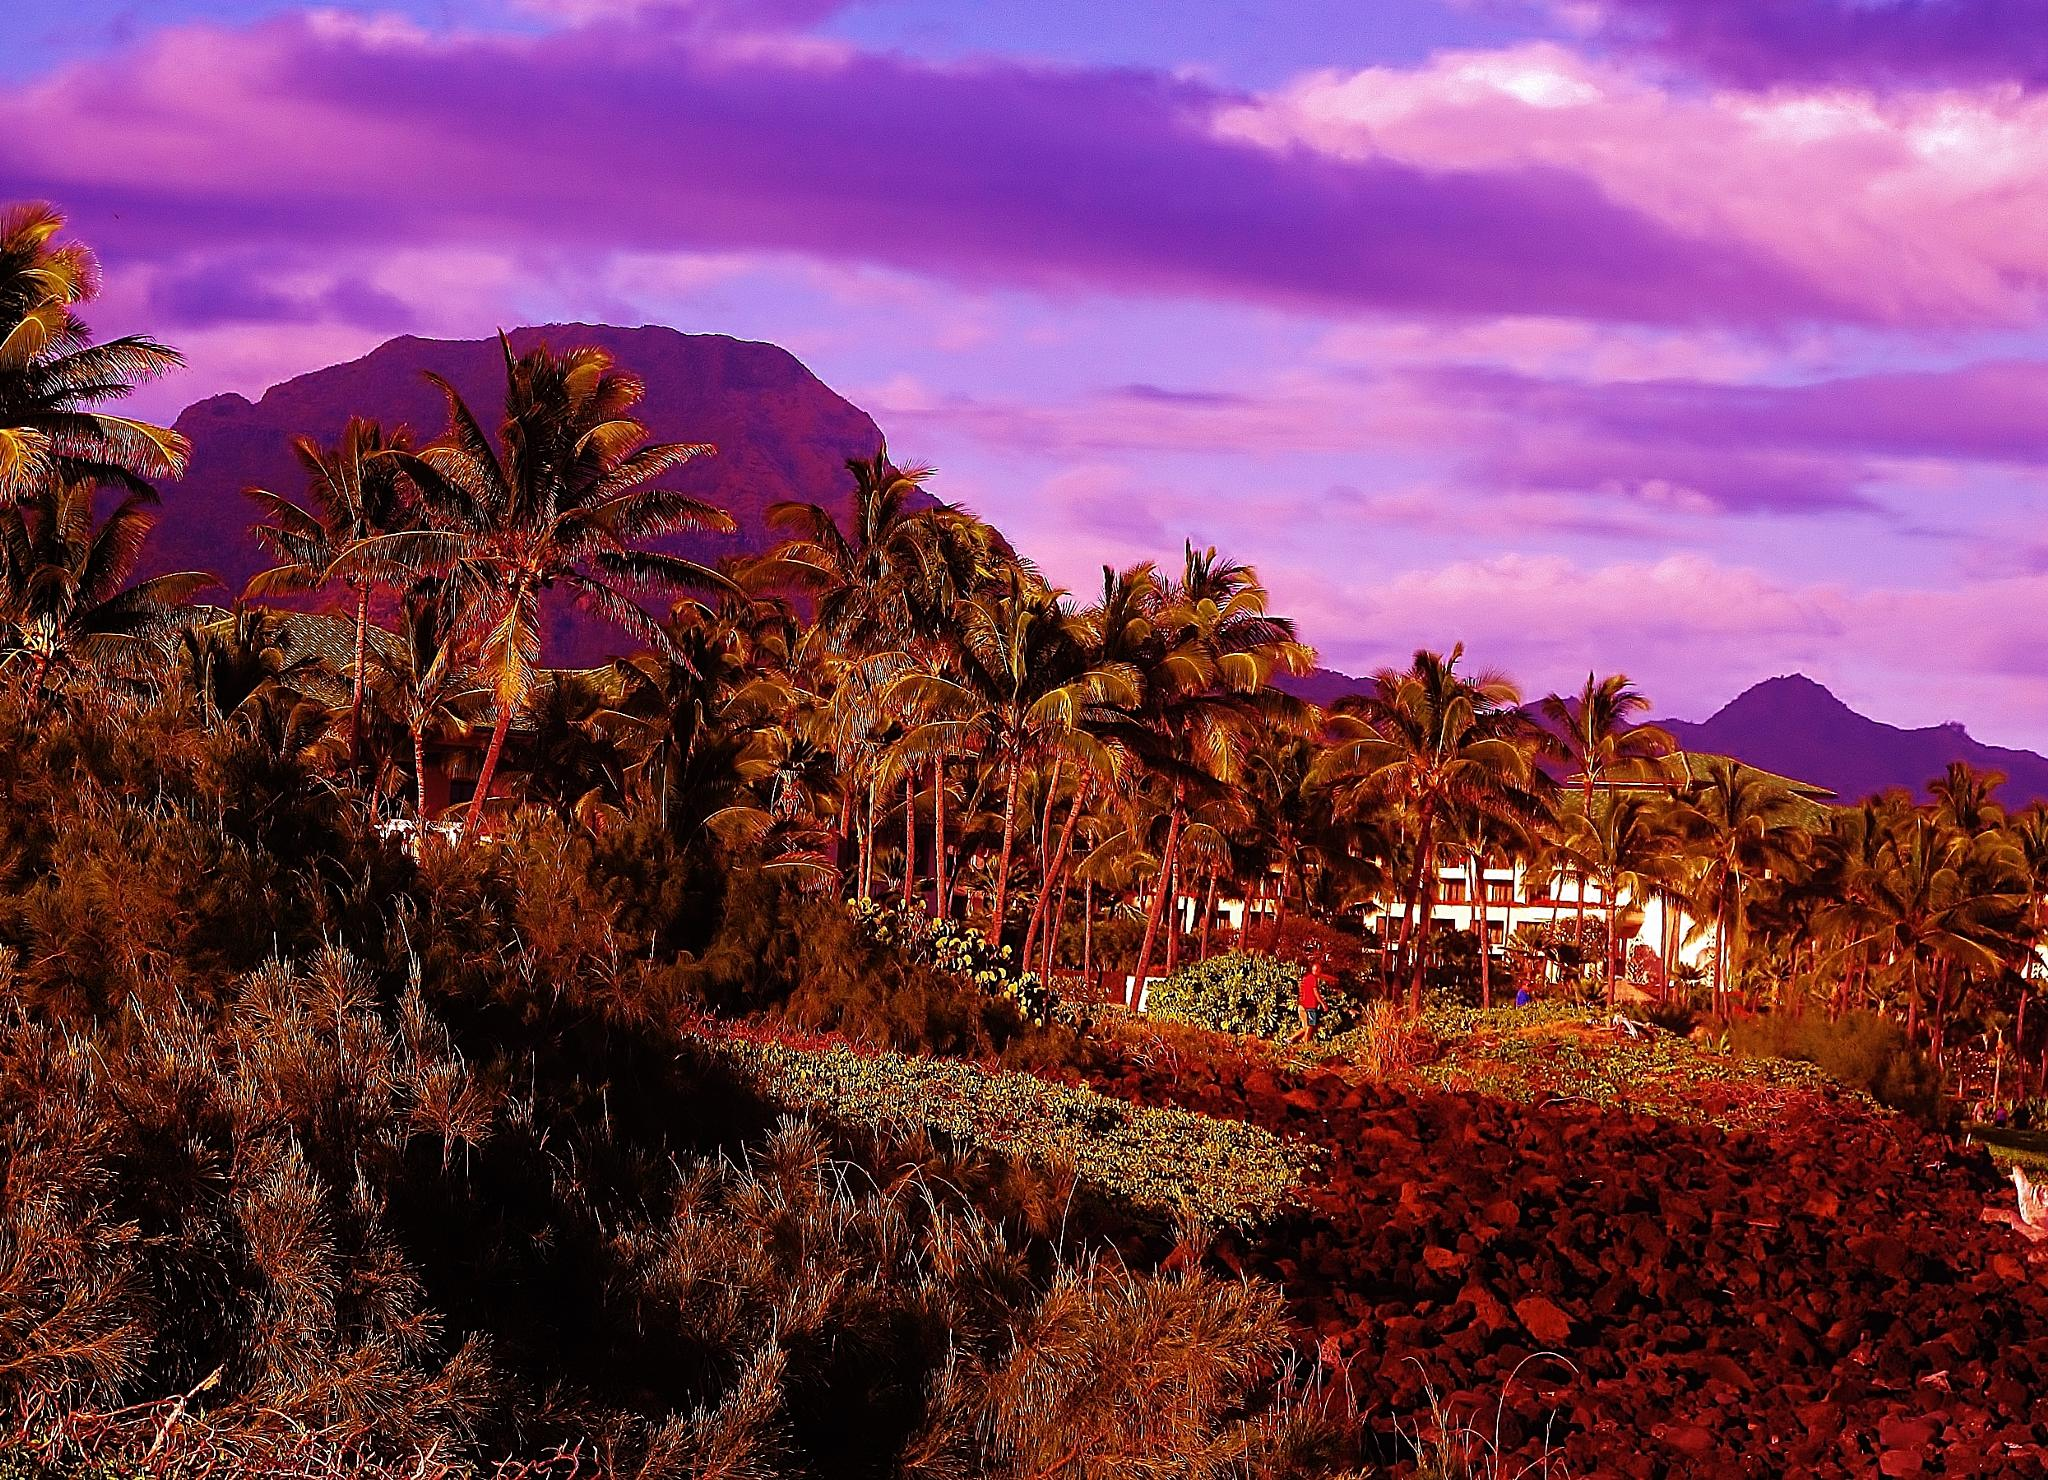 HAWAII USA BY PAUL CRIMI. by paulcrimi178